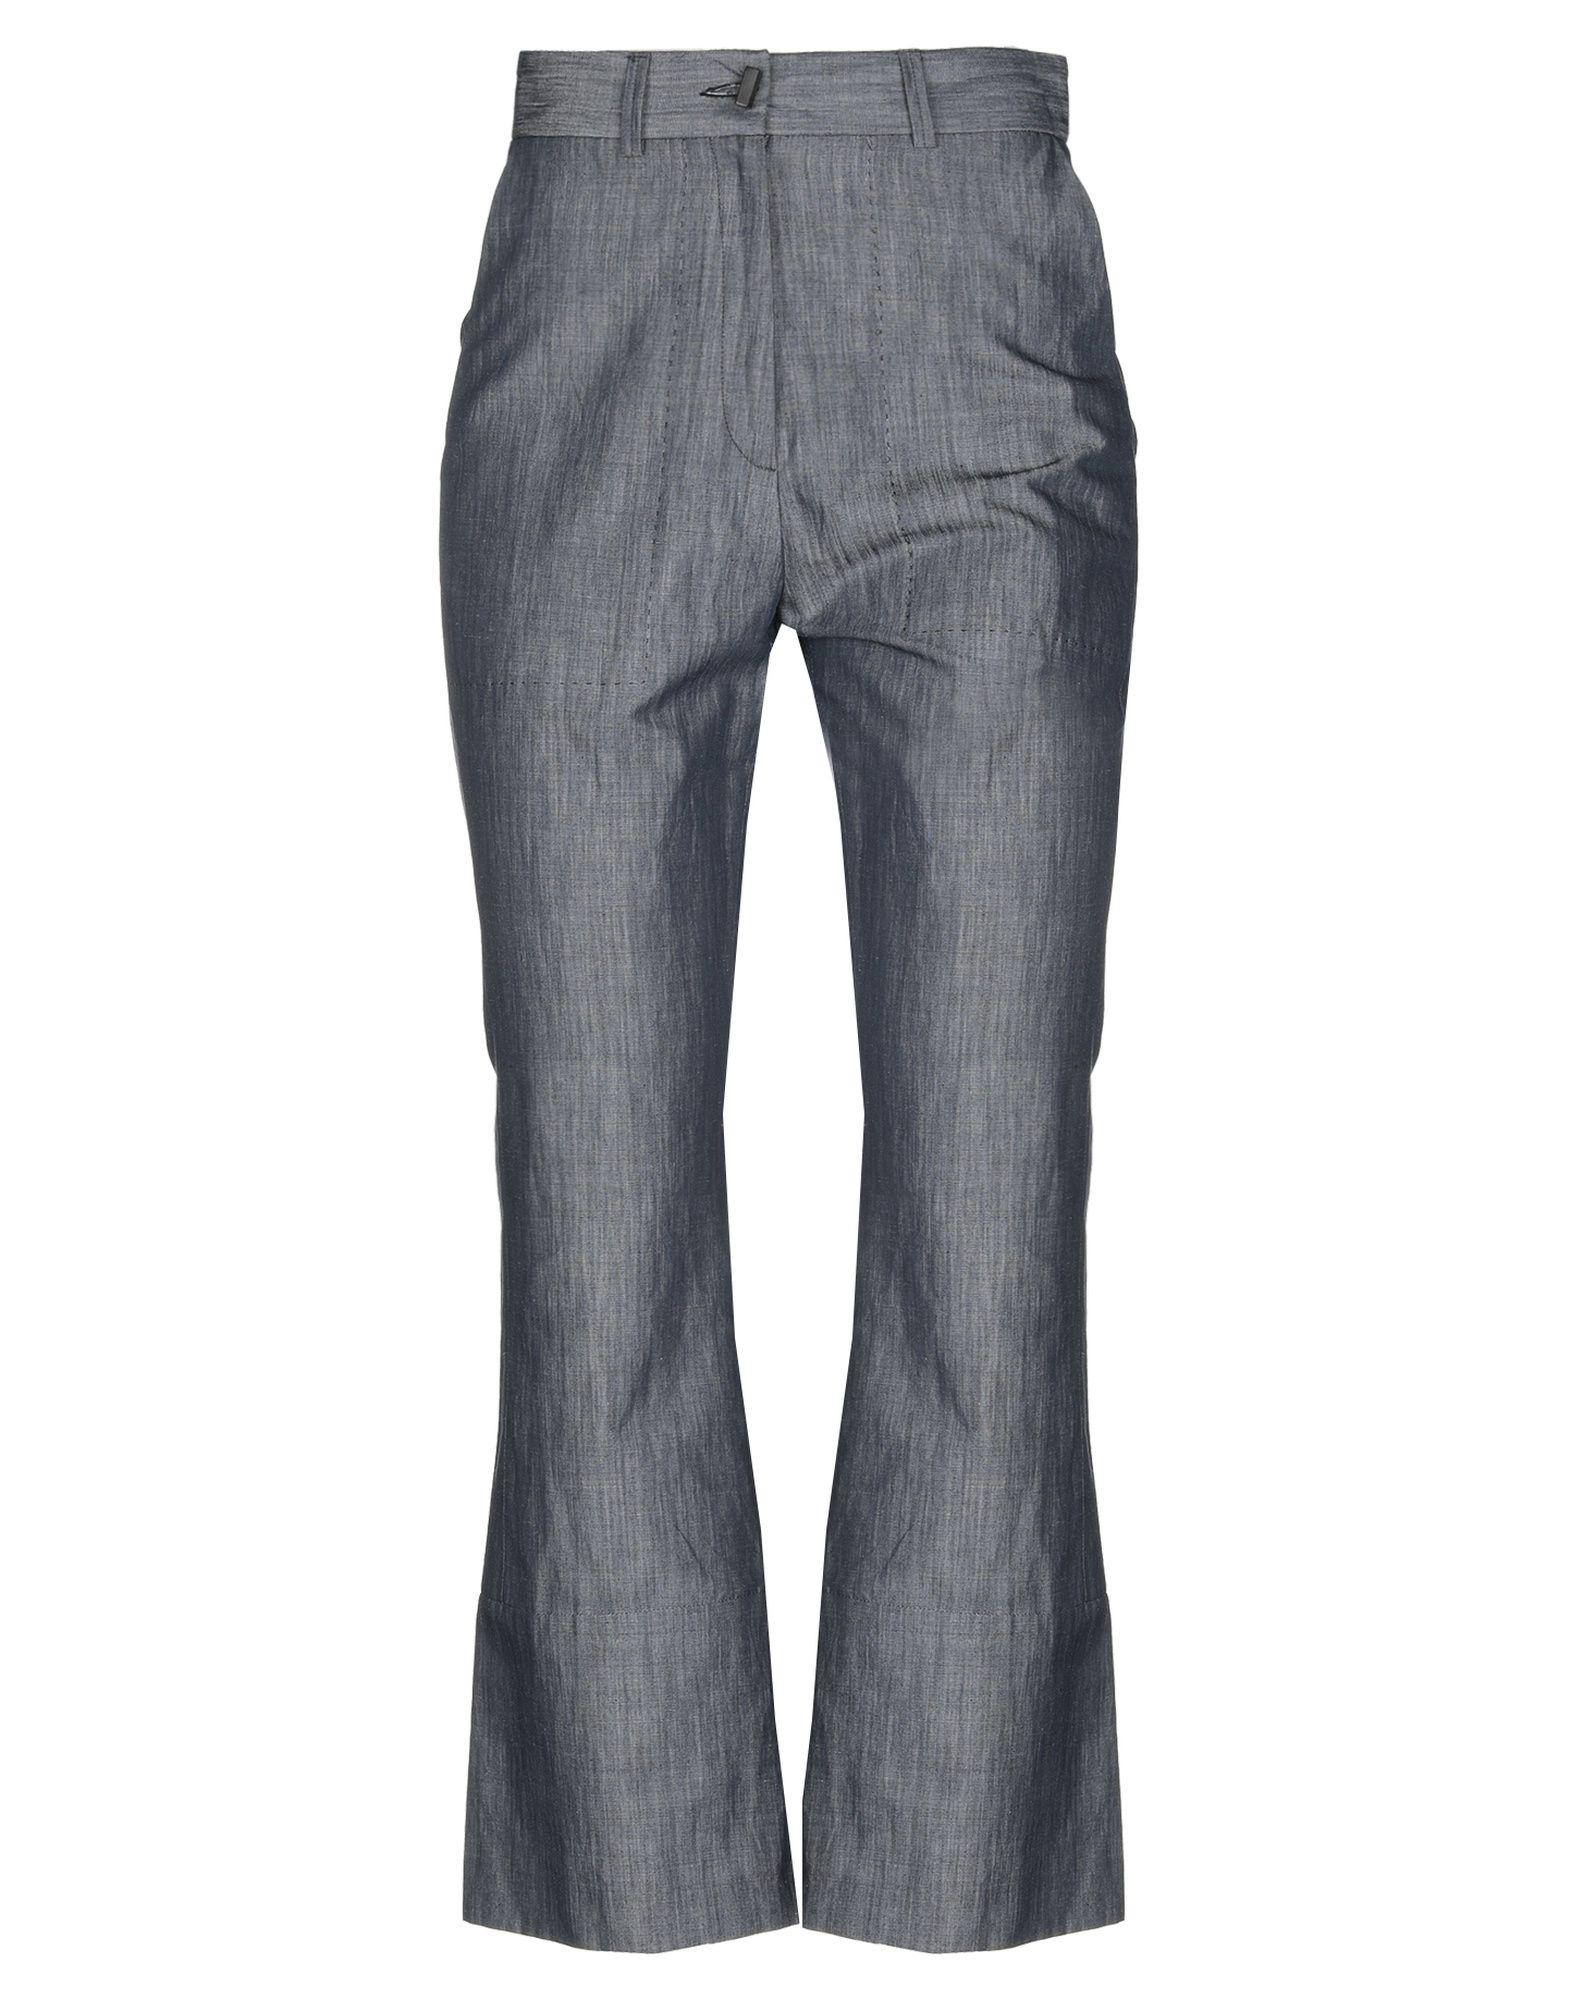 Pantaloni Jeans Roberta Roberta Roberta Furlanetto donna - 42721499WH 332